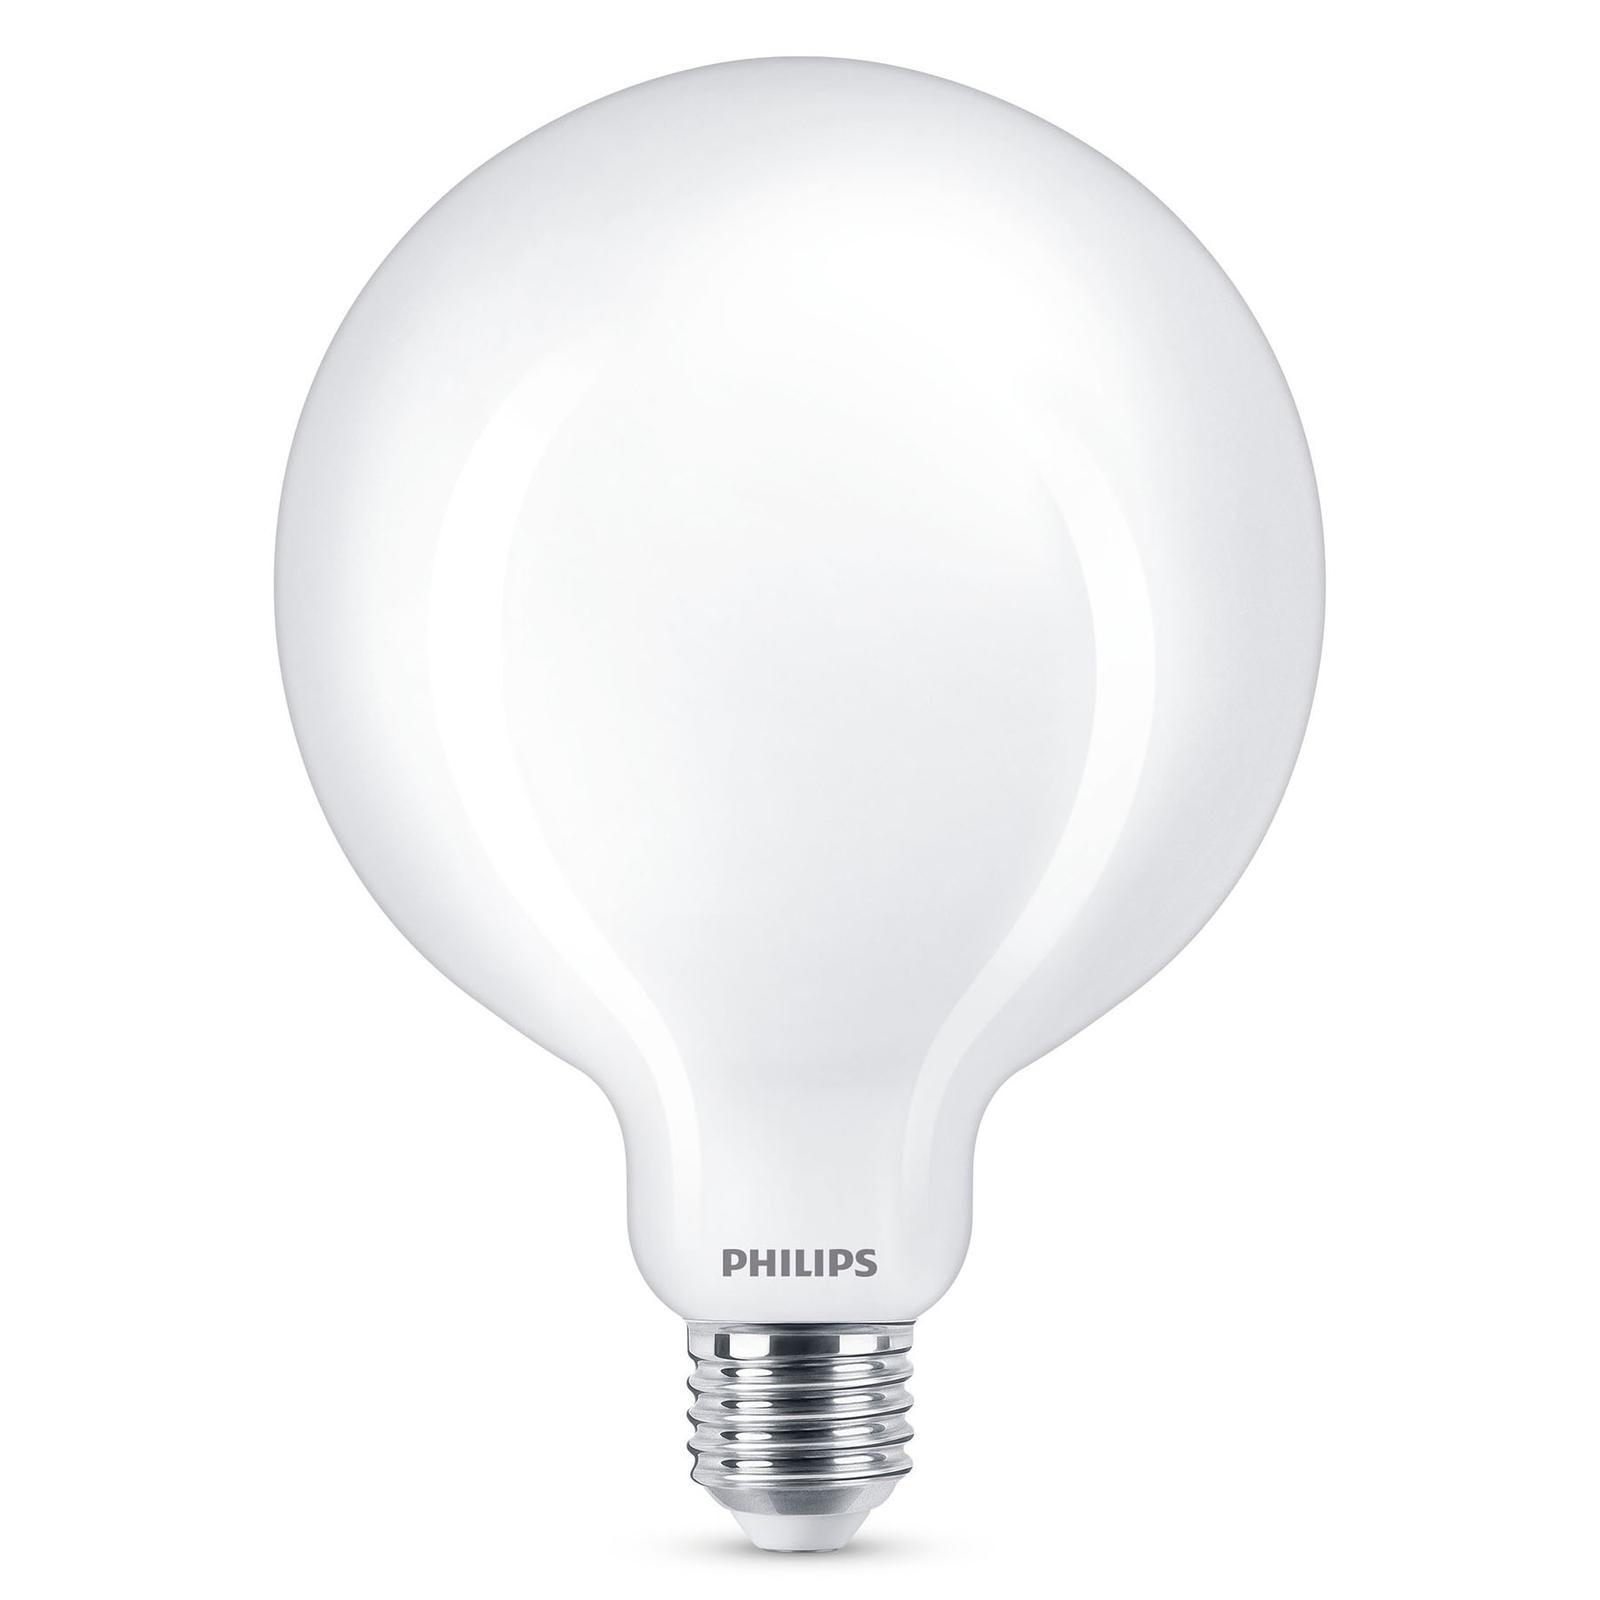 Philips LED Classic Globelampe E27 G120 8,5W matt